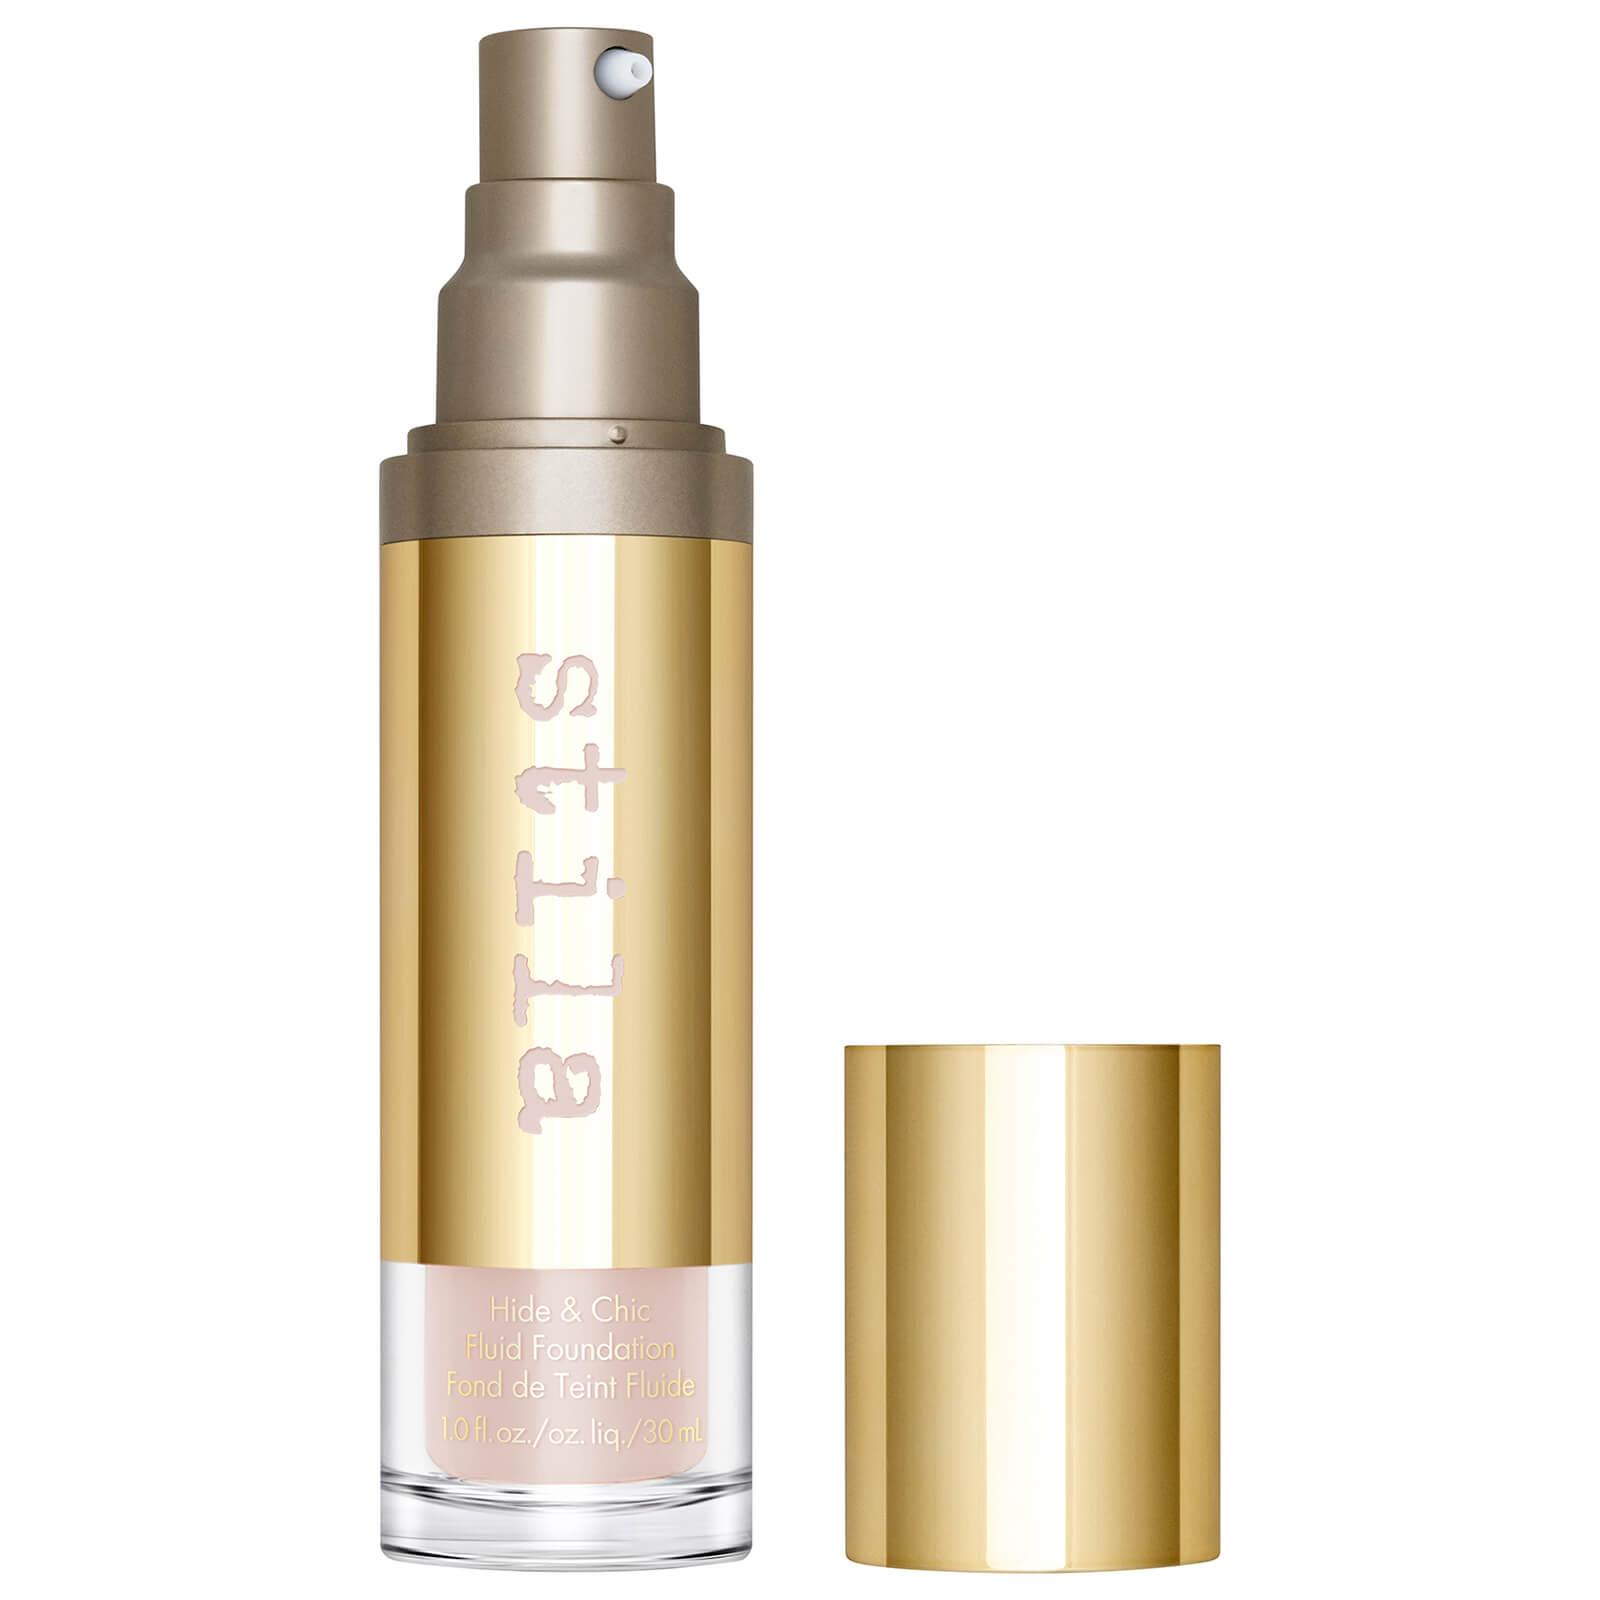 Купить Stila Hide and Chic Fluid Foundation 30ml (Various Shades) - Light 1